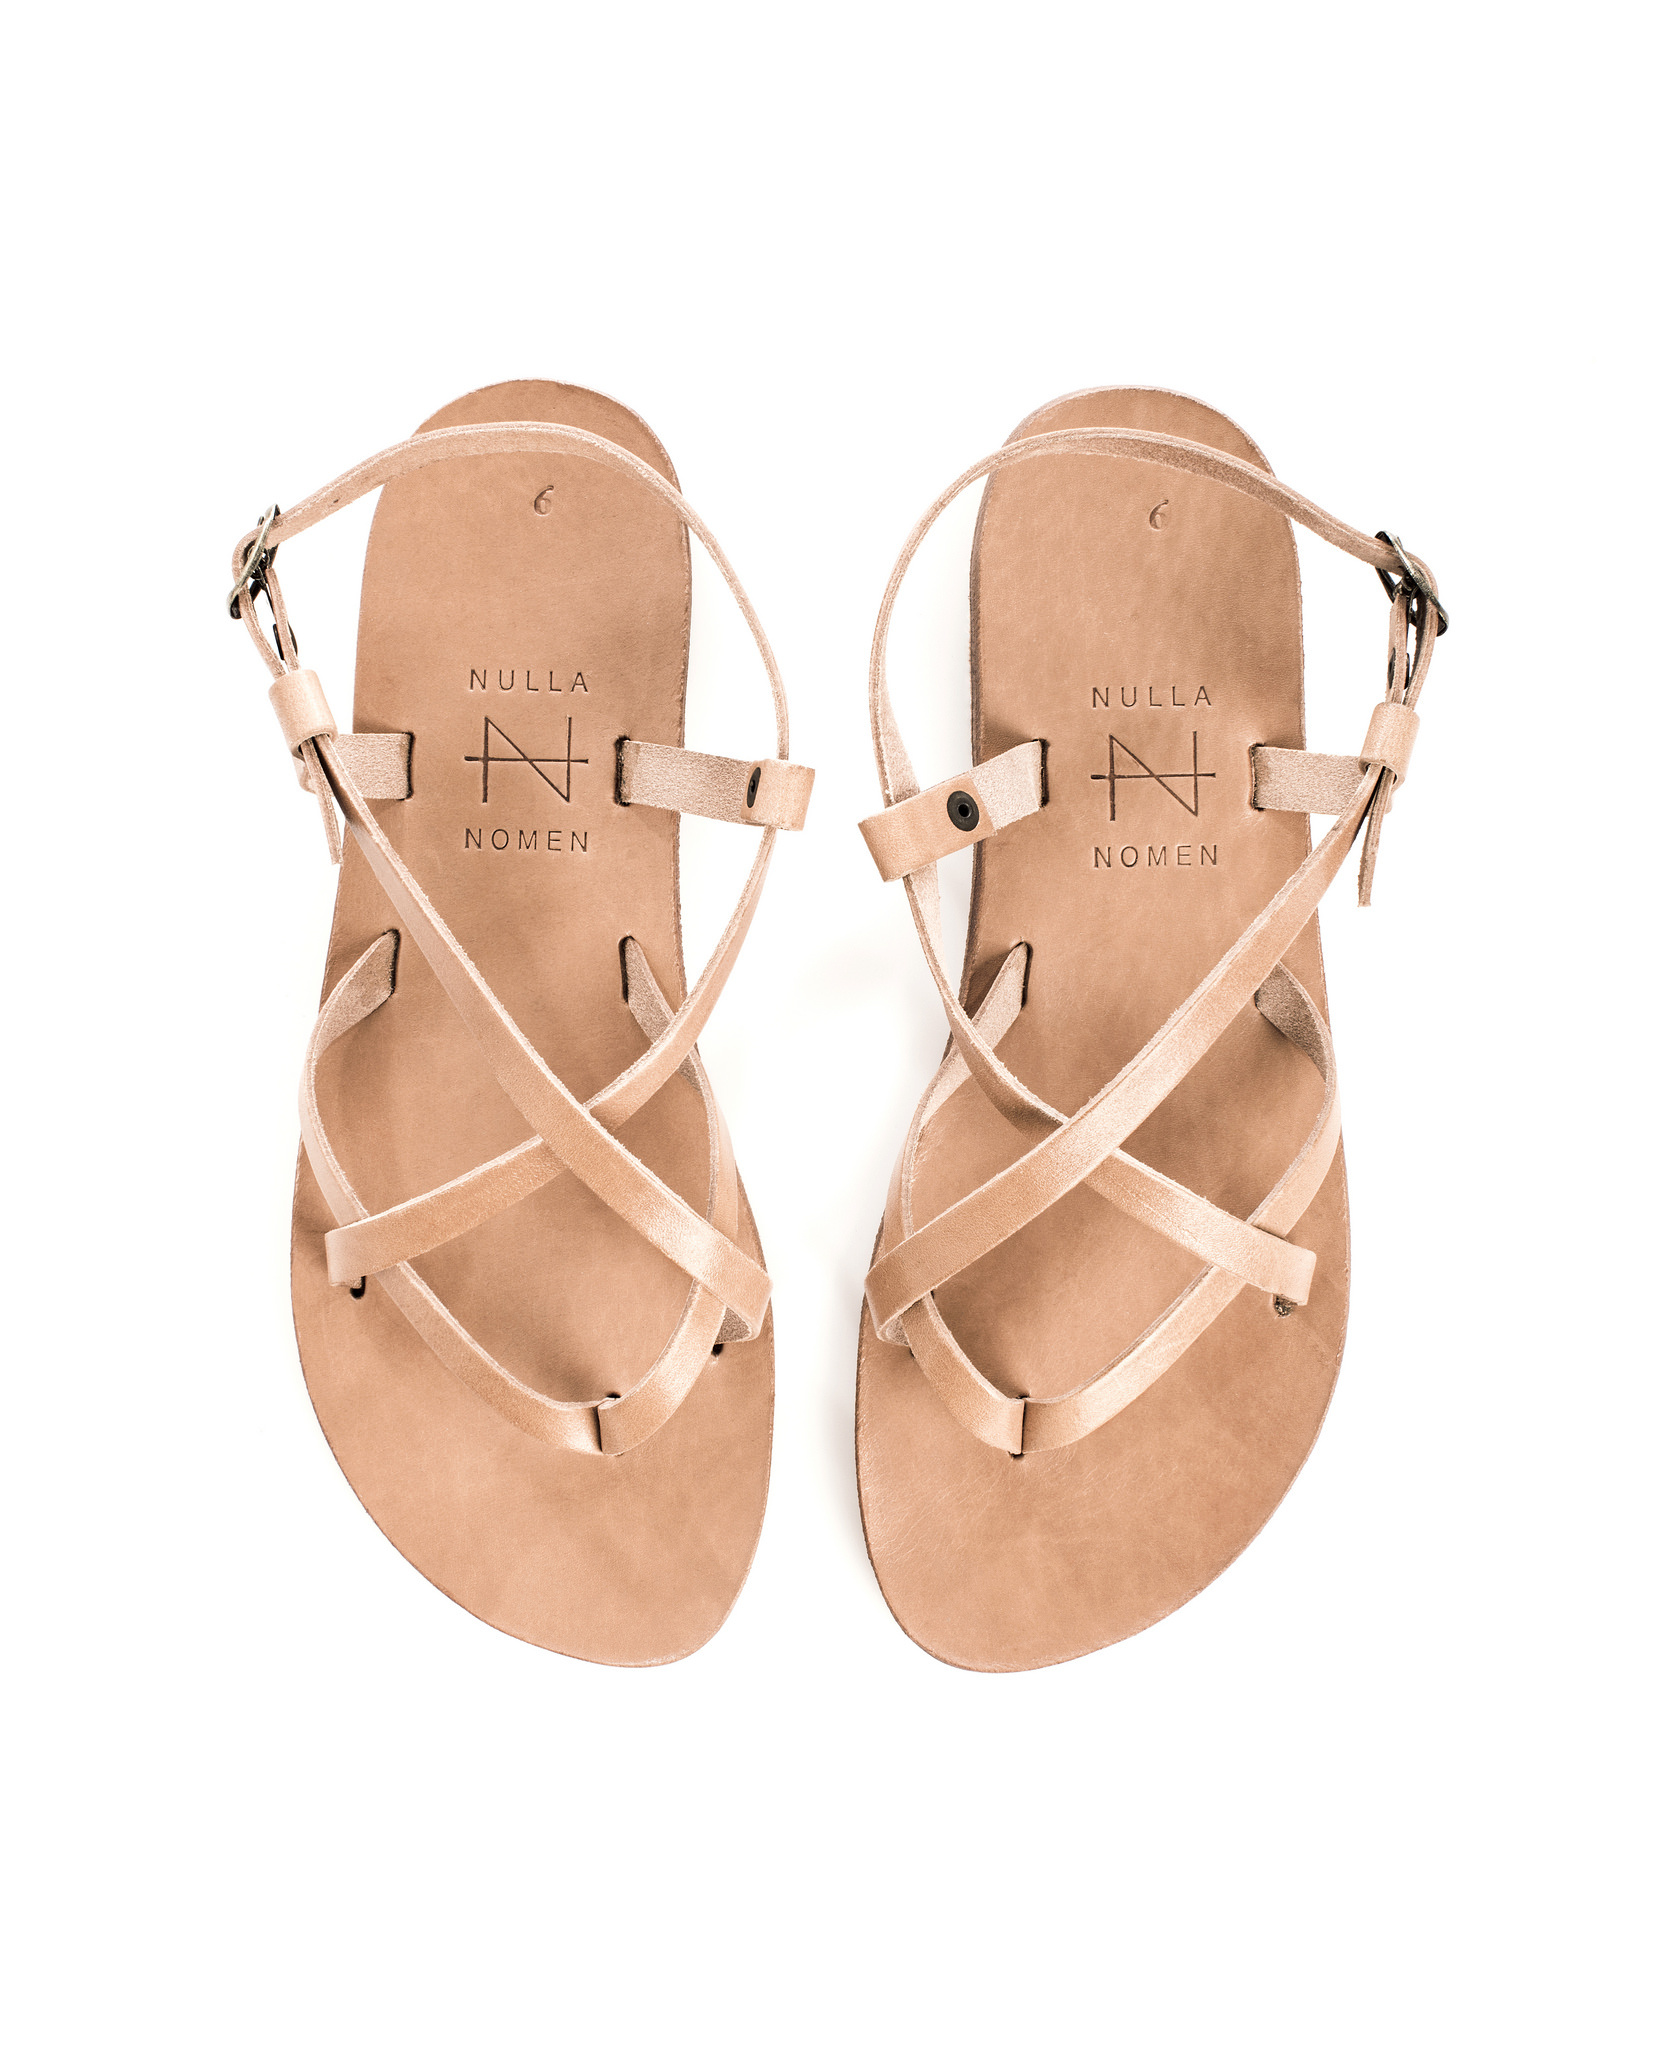 Nulla Nomen Nulla Nomen | Sandal Toe Cross Strap Small Natural Vegetable Tanned Leather